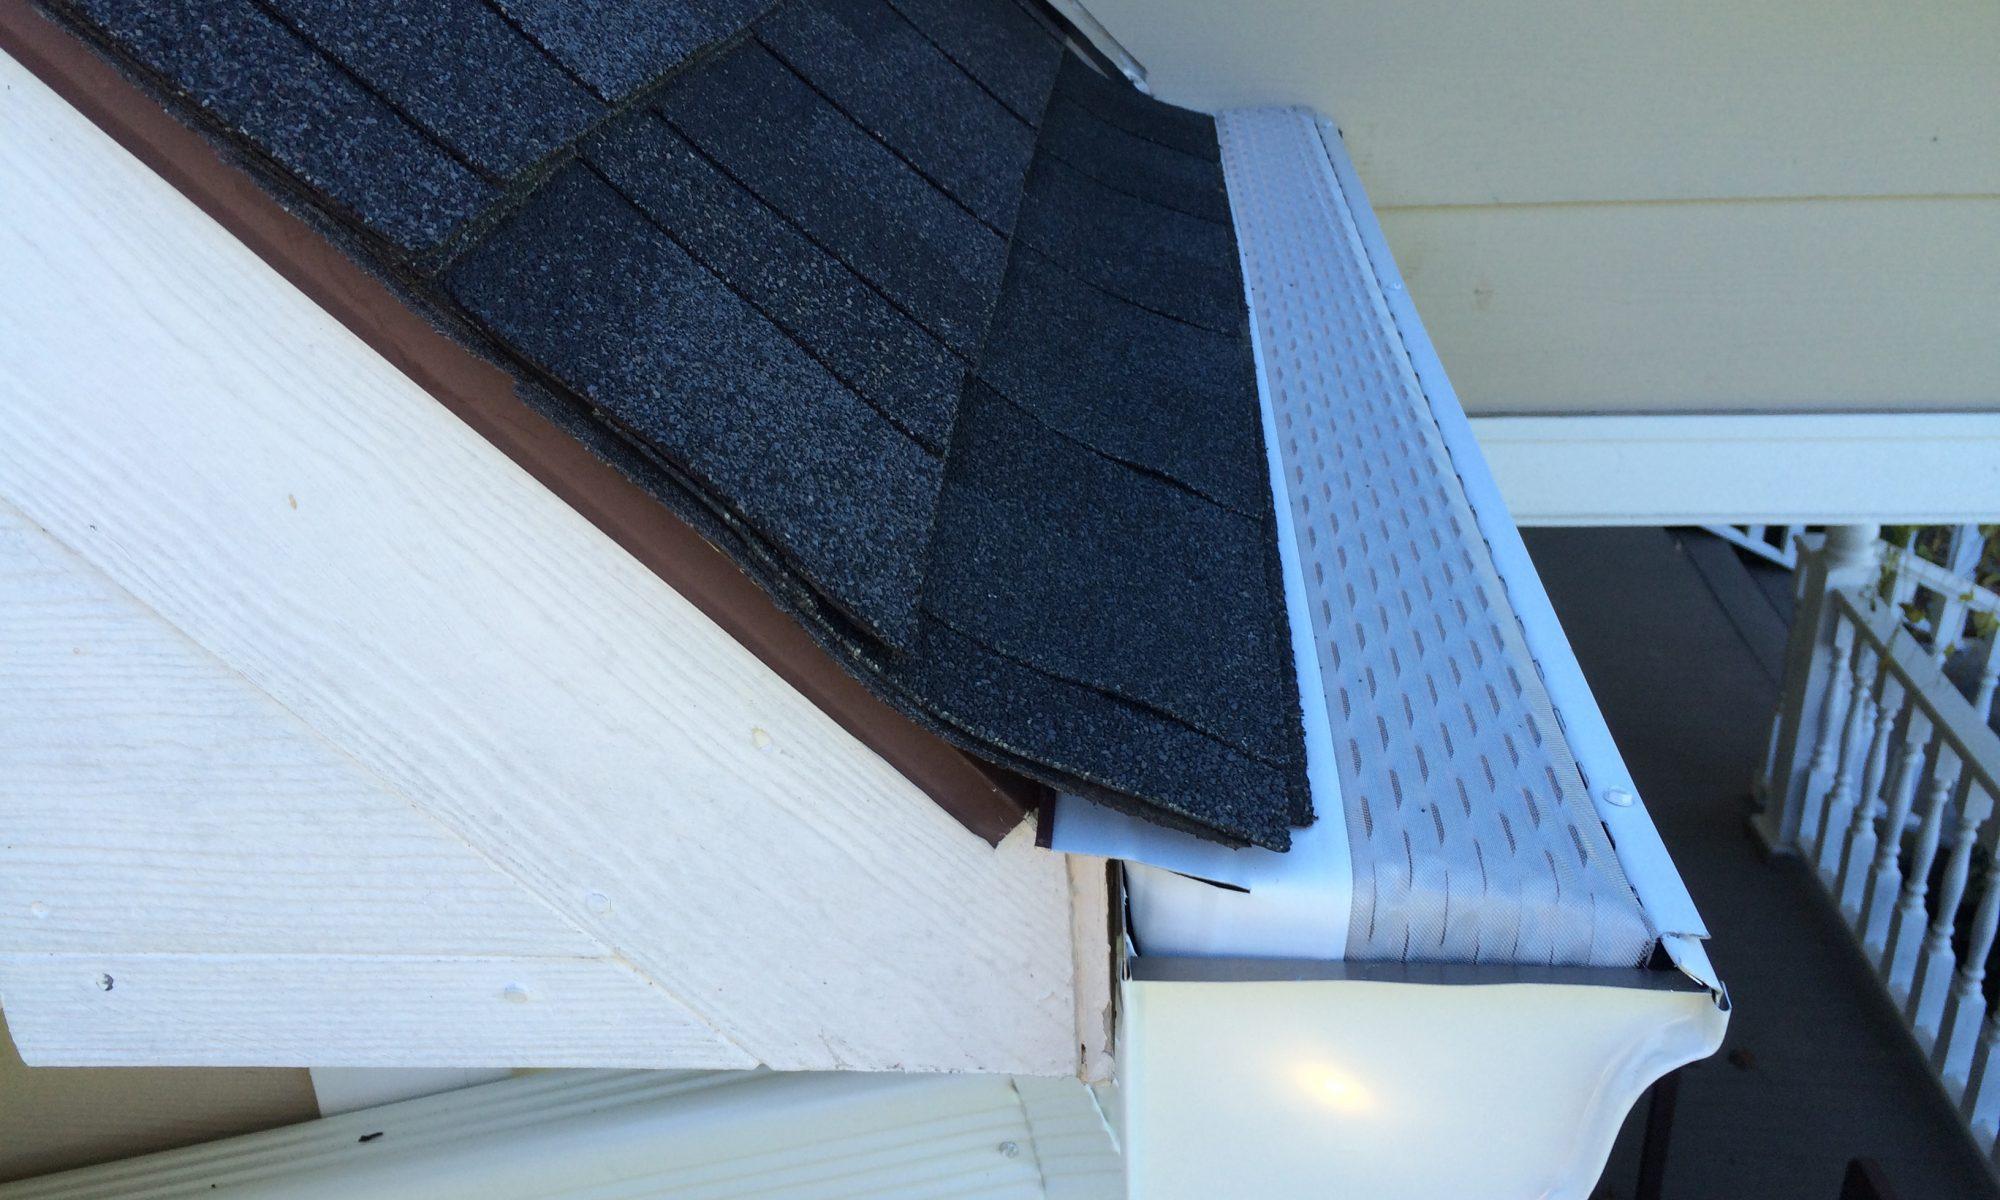 microscreen u.s. gutter guard side angle